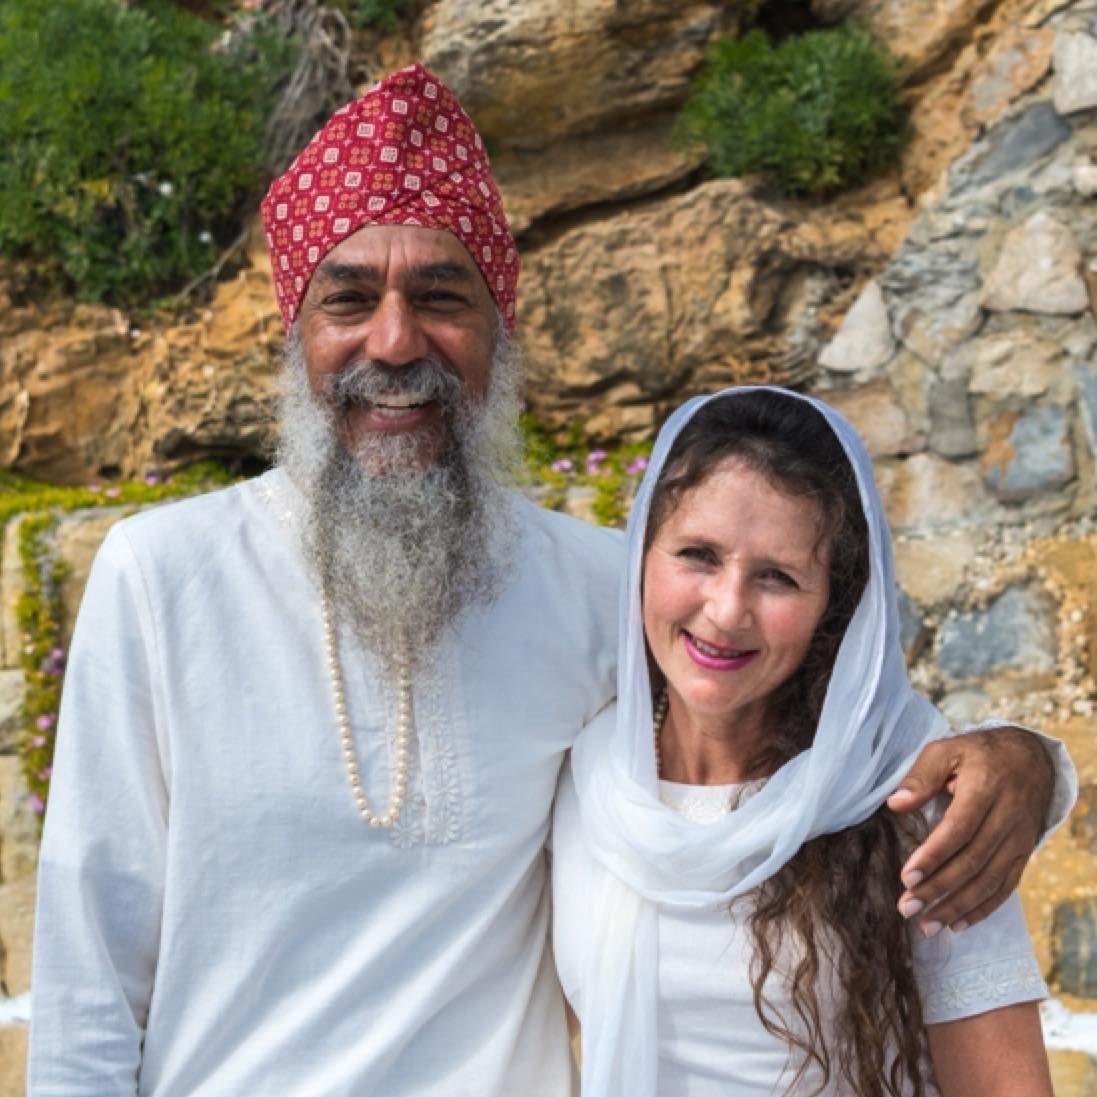 Sikh Priest for Sikh Wedding in Italy